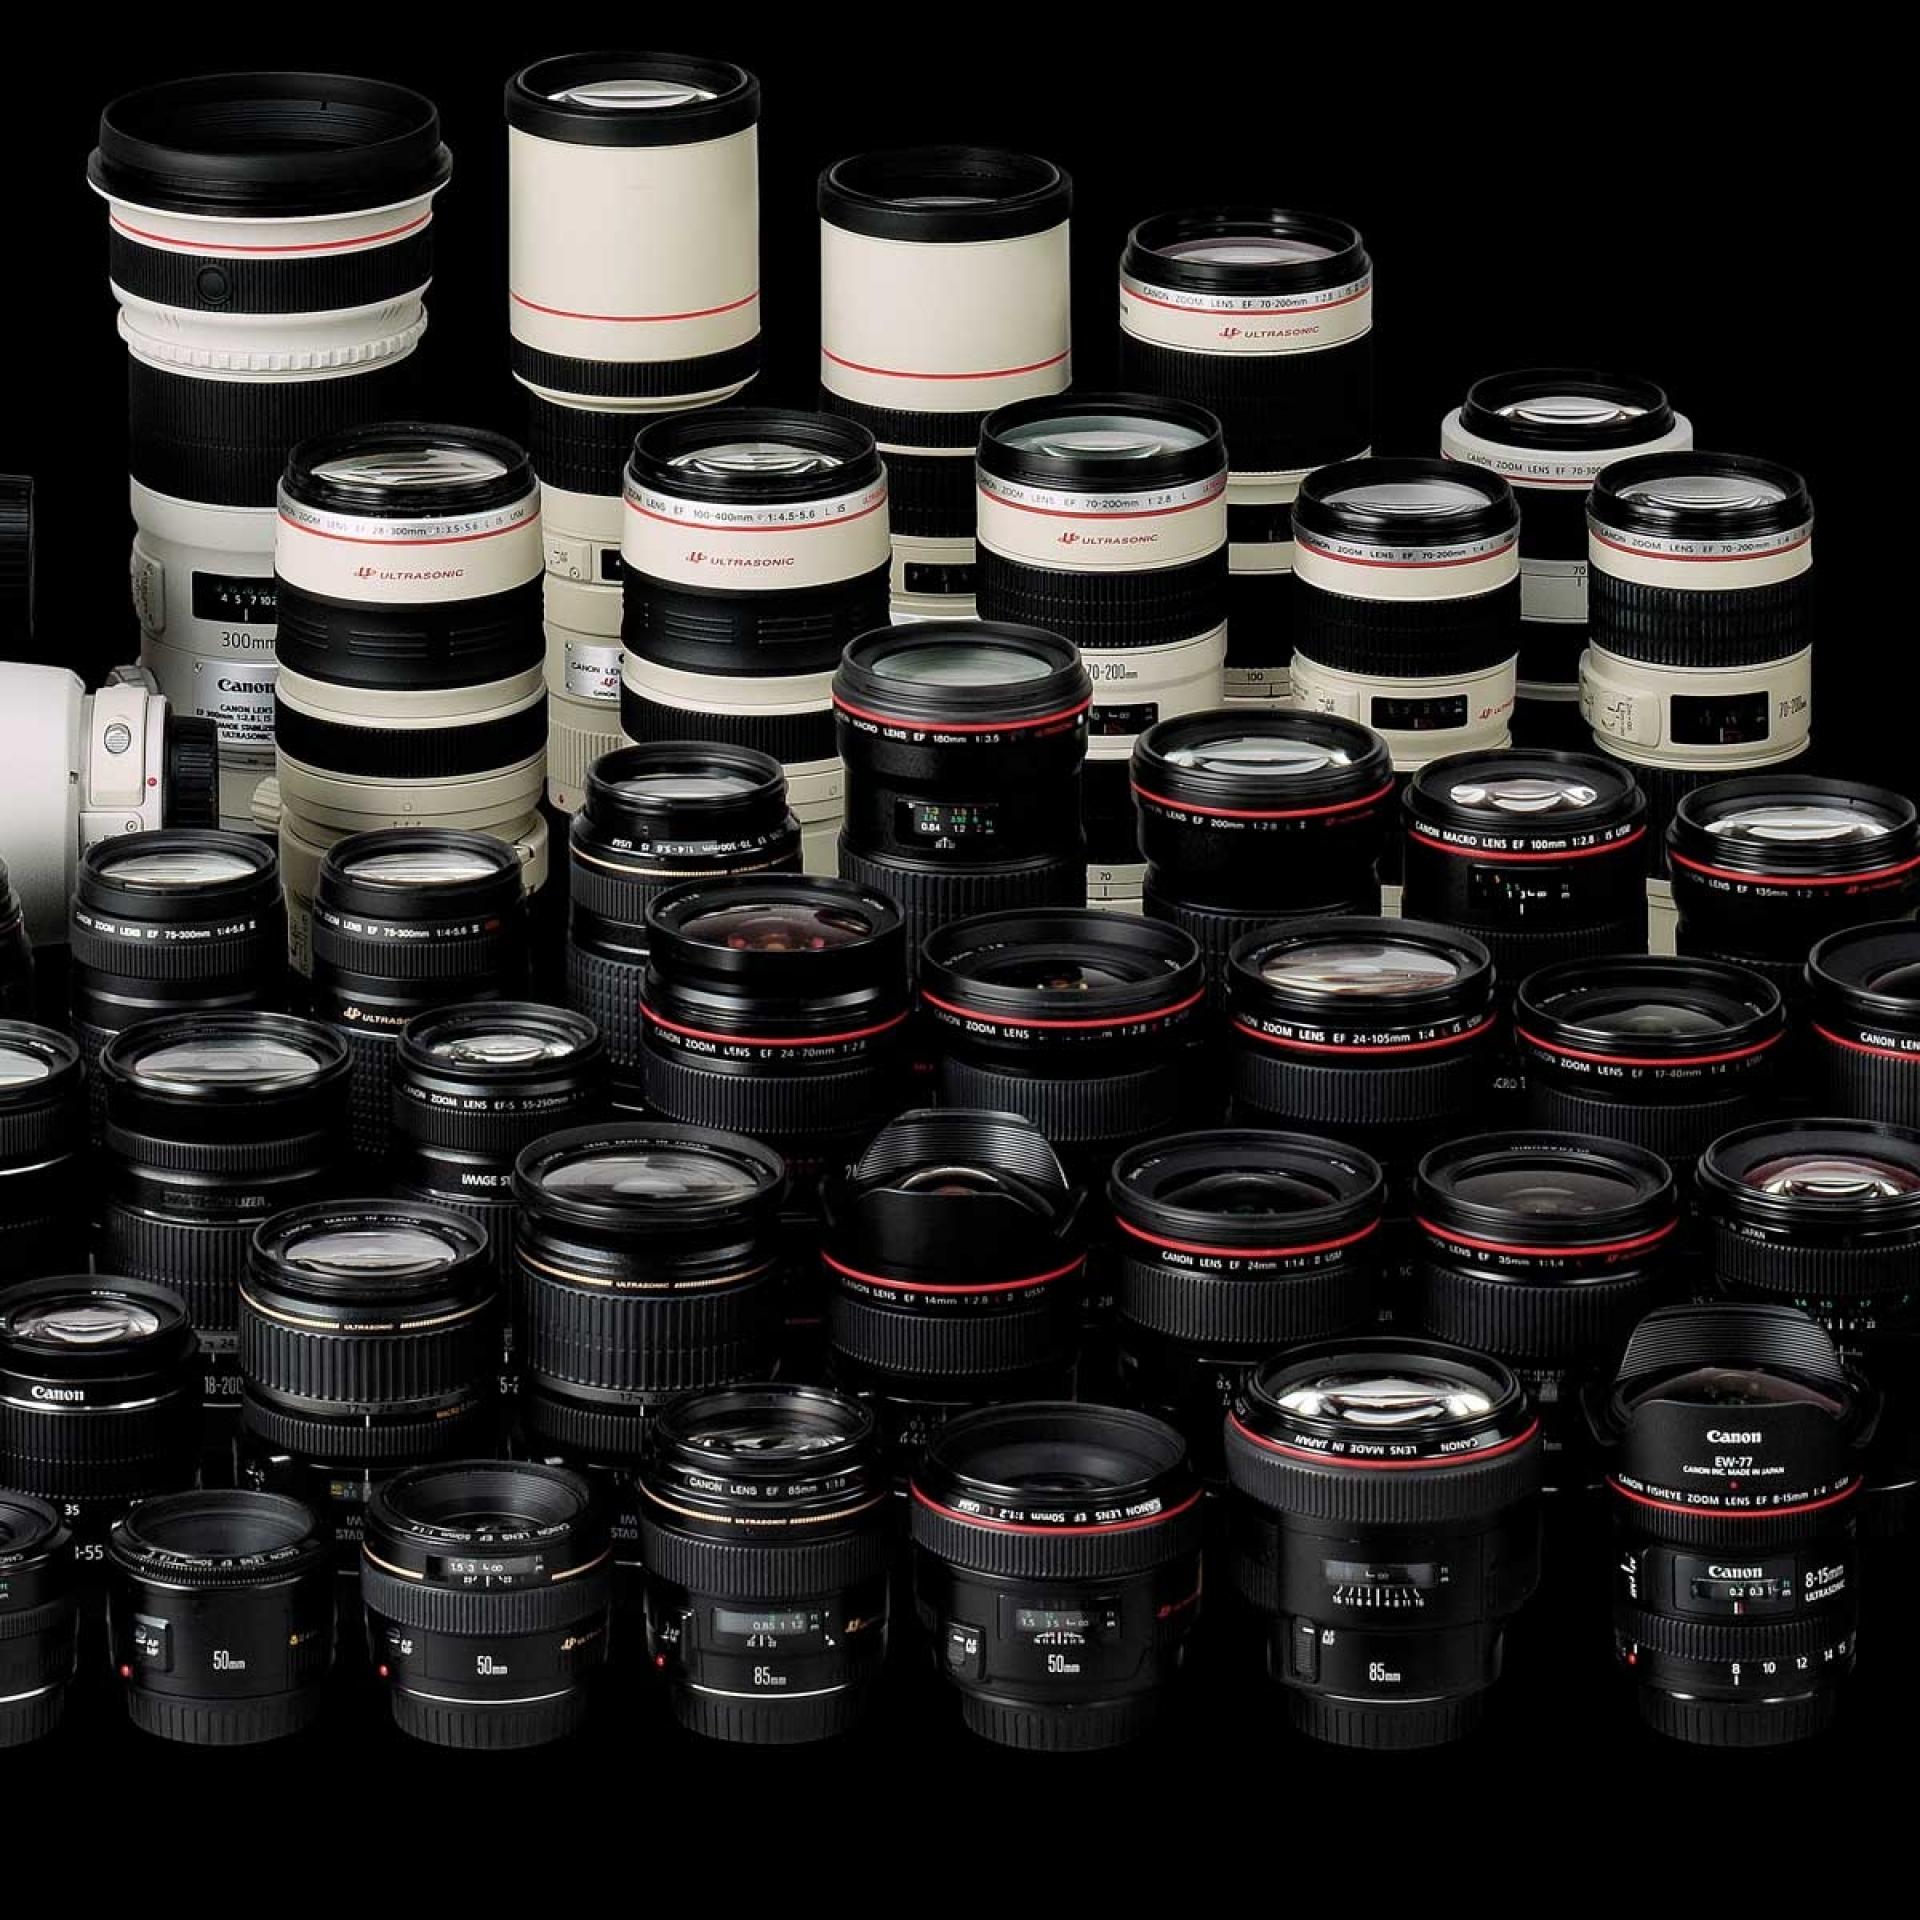 Canon, Objektiv, EF-Objektiv, RF-Objektiv